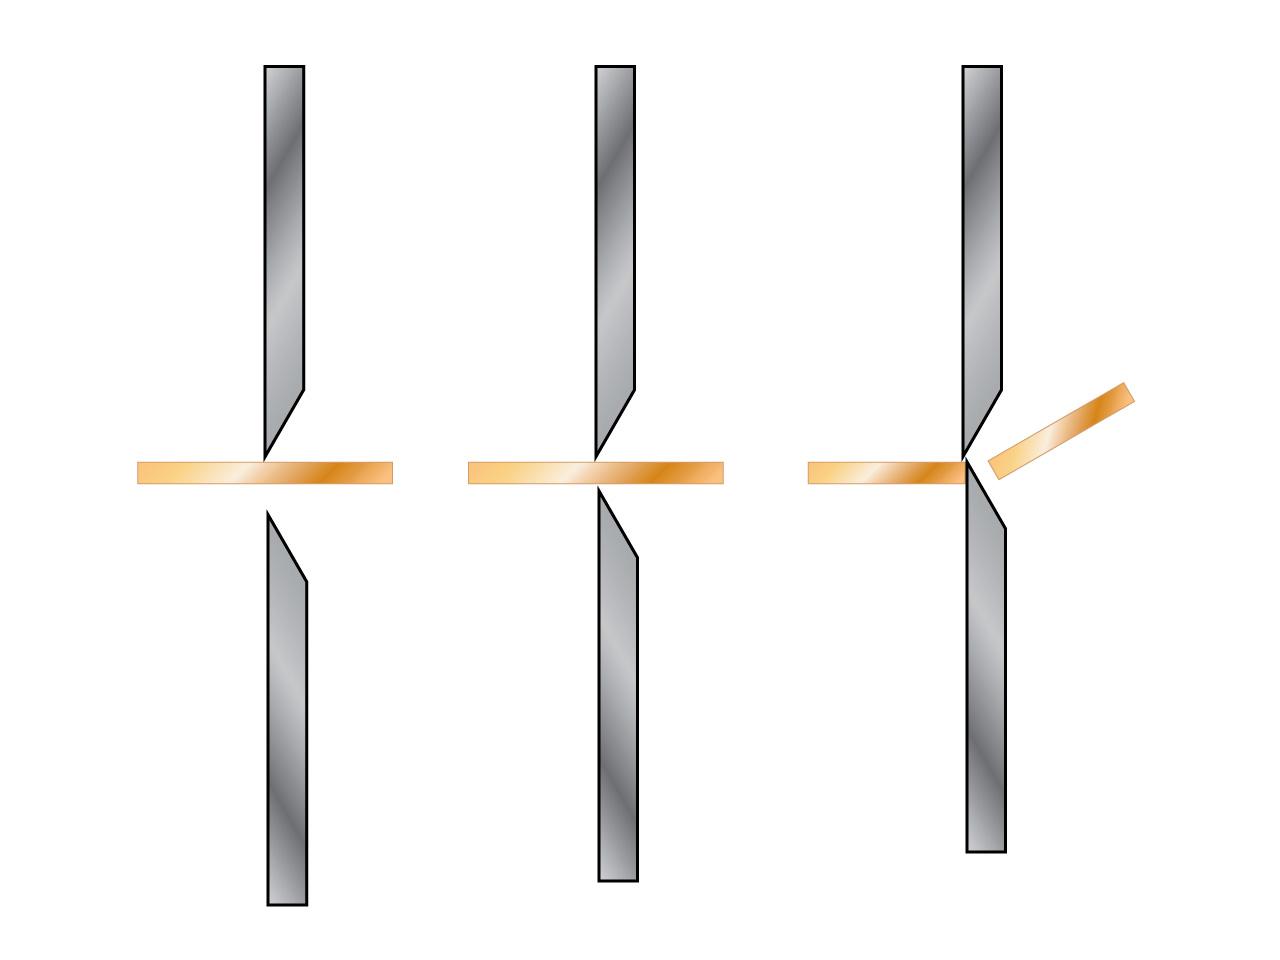 Xuron-Multi-Purpose-Pliers-Cutters-Shears-and-Scissors thumbnail 22